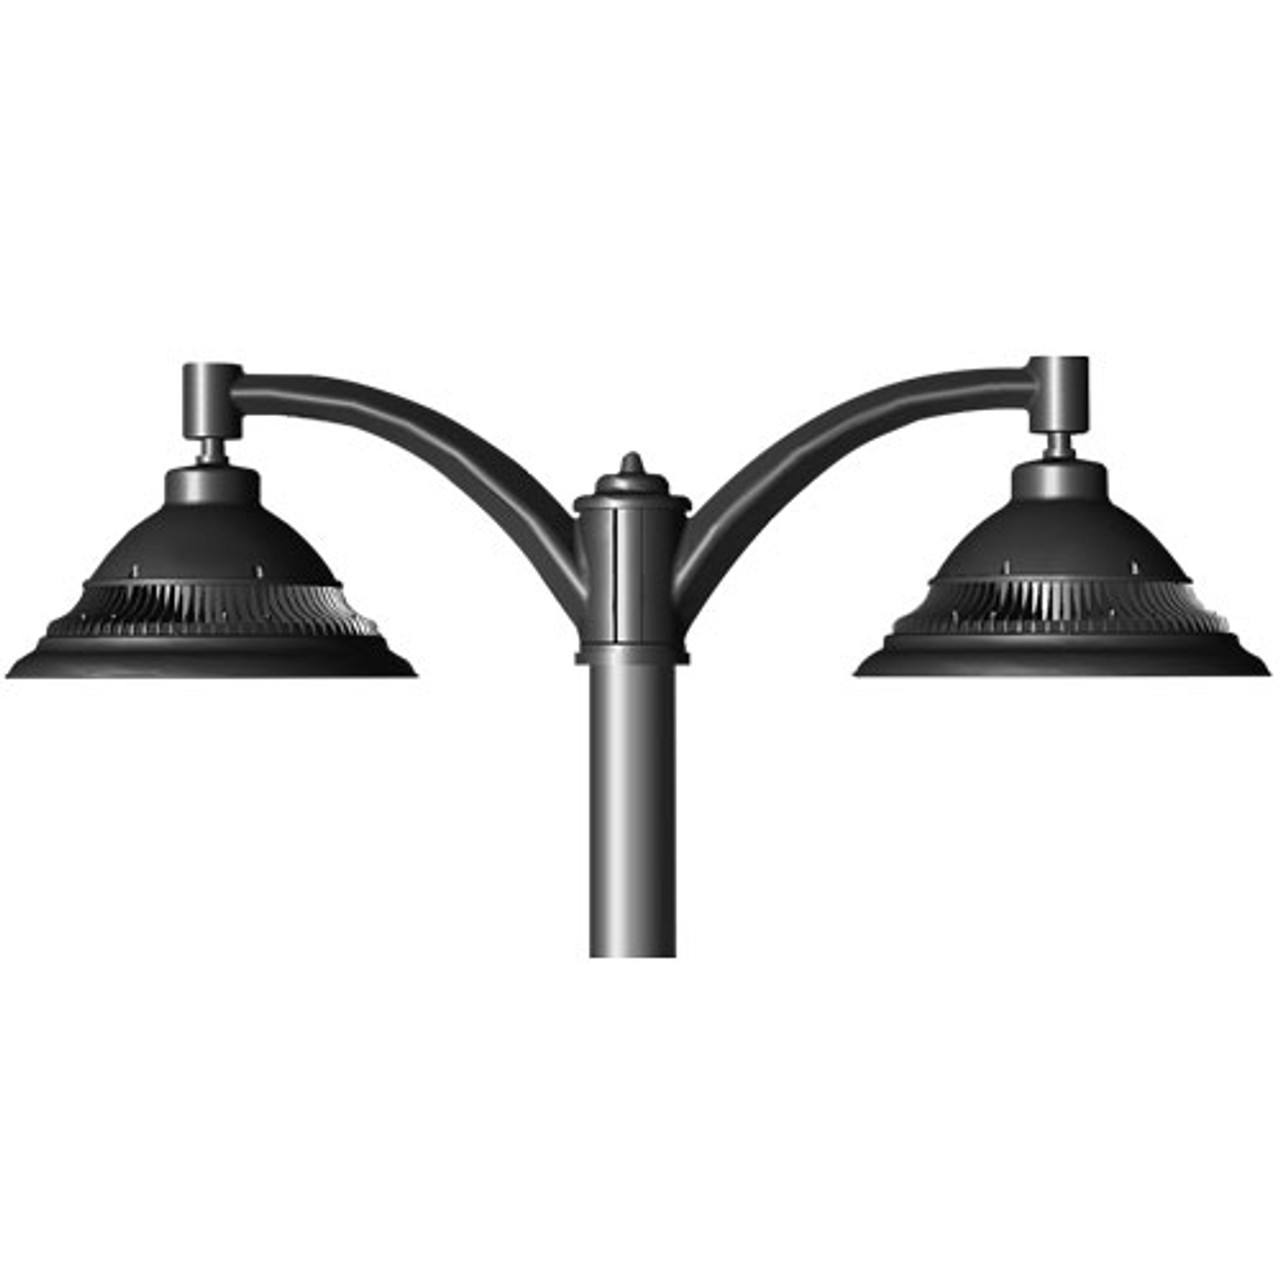 Bell 2 x 65 Watt Pendant LED Decorative Pole Mounted